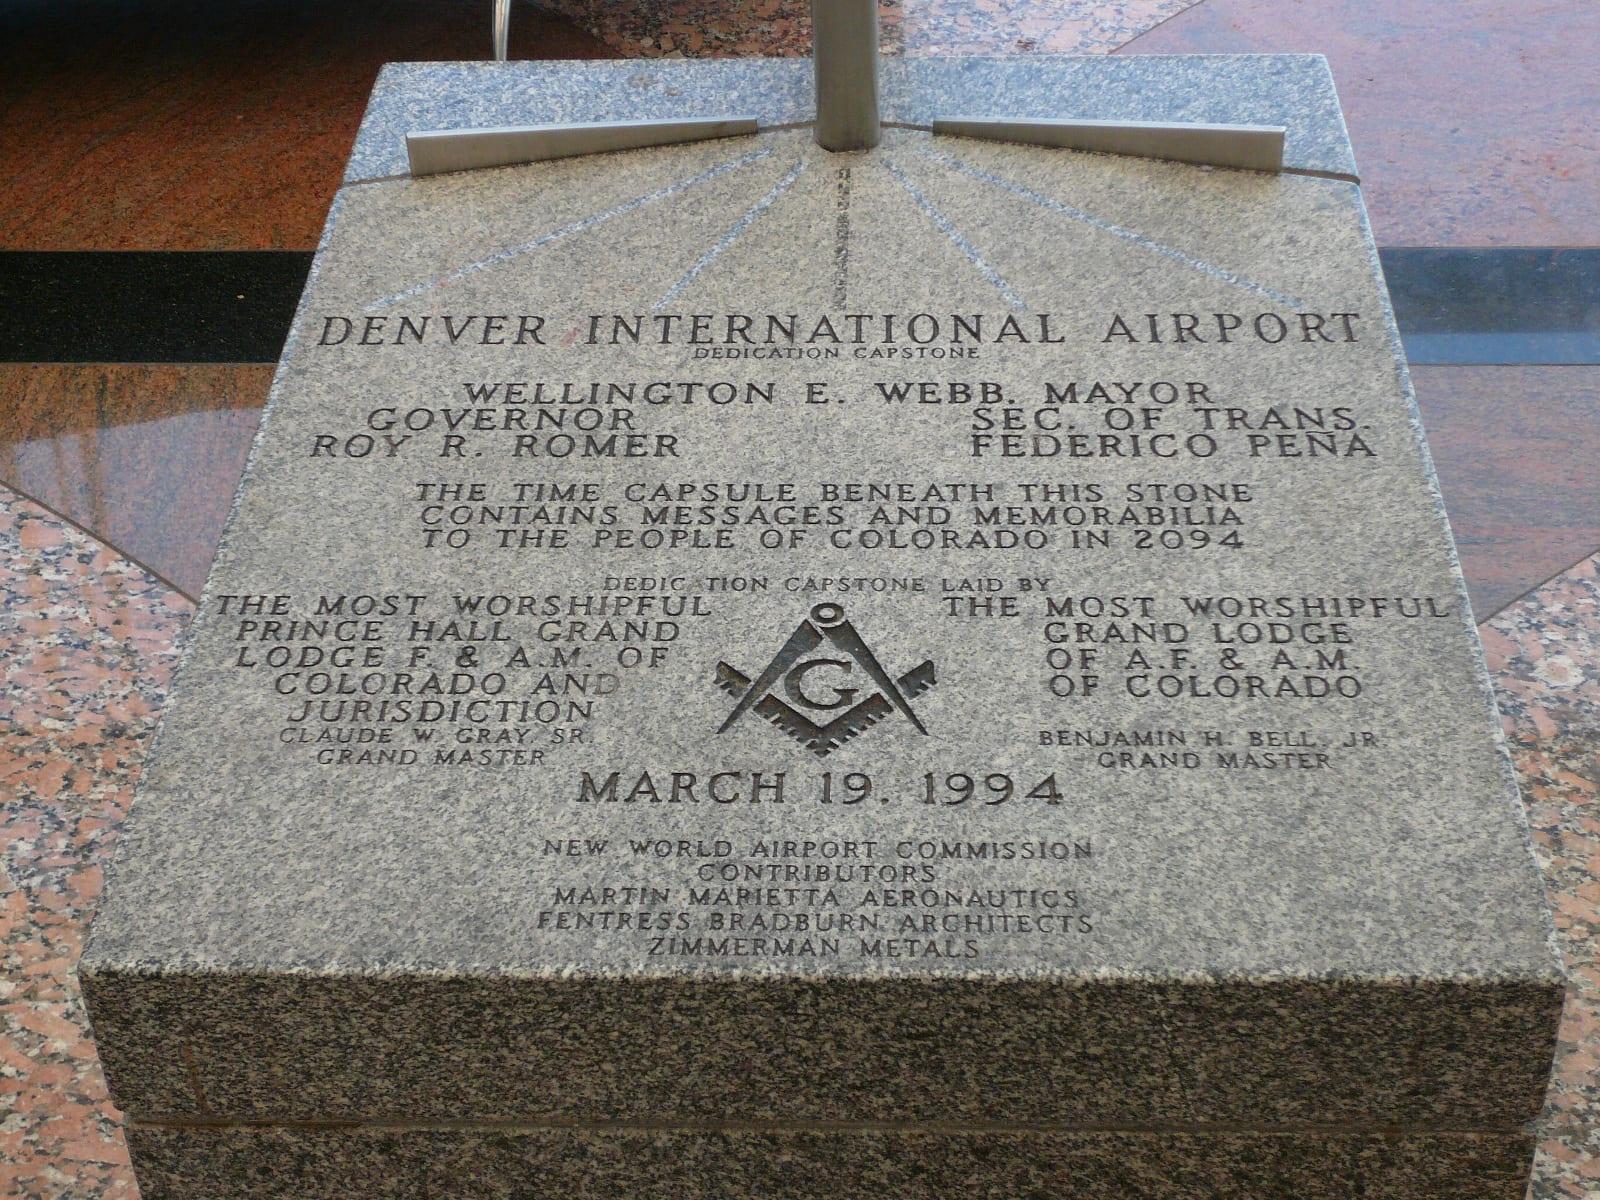 DIA Conspiracy Theories Denver International Airport Dedication Capstone